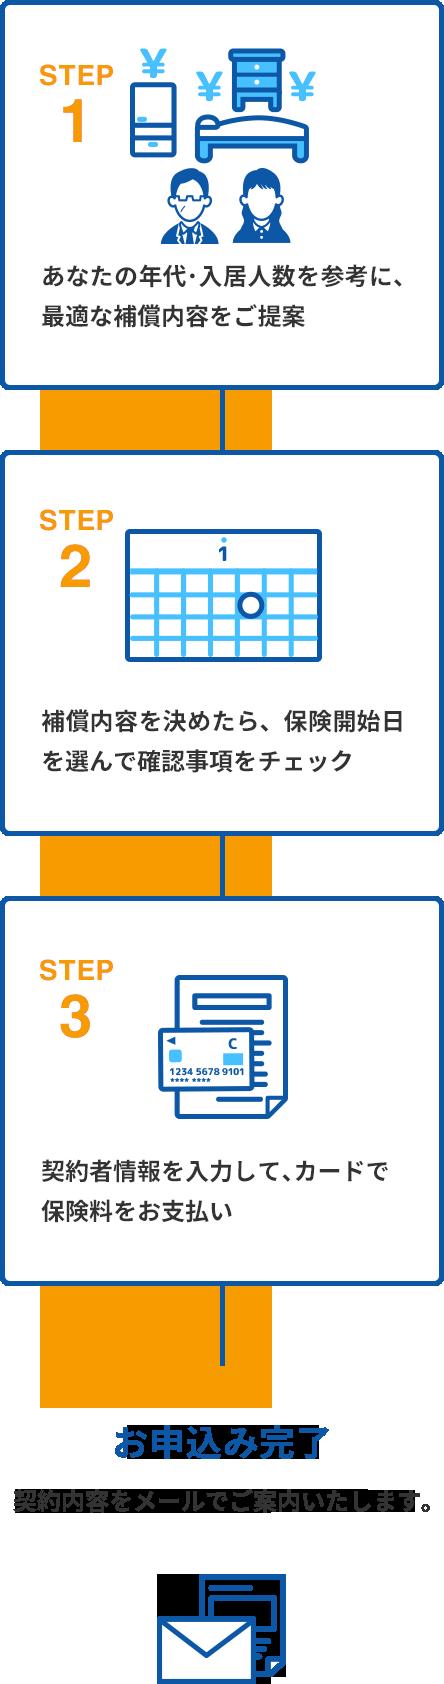 step1 あなたの年代・入居人数を参考に、最適な補償内容をご提案 step2 補償内容を決めたら、保険開始日を選んで確認事項をチェック step3 契約者情報を入力して、カードで保険料をお支払い